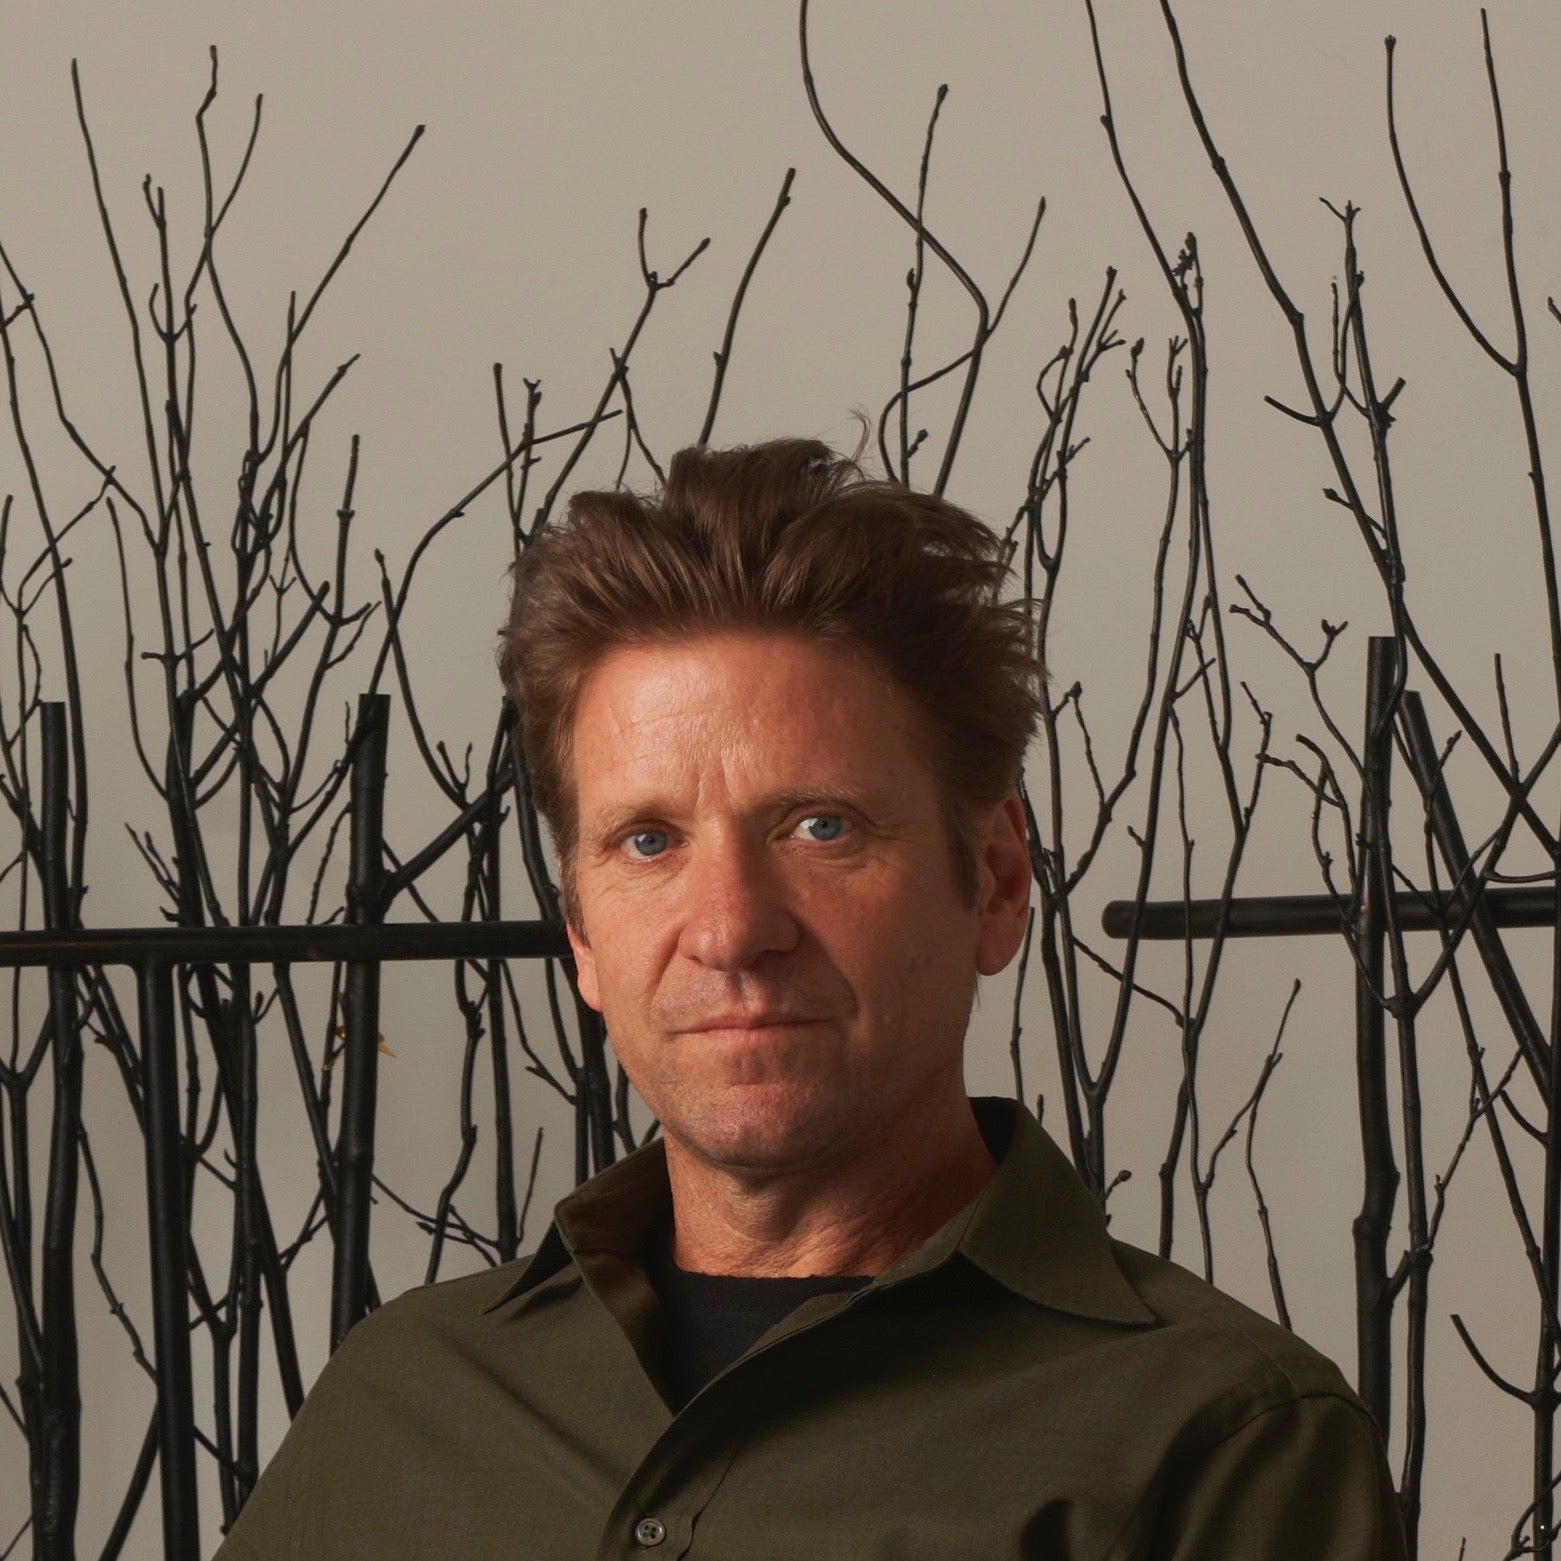 Chris Lehrecke